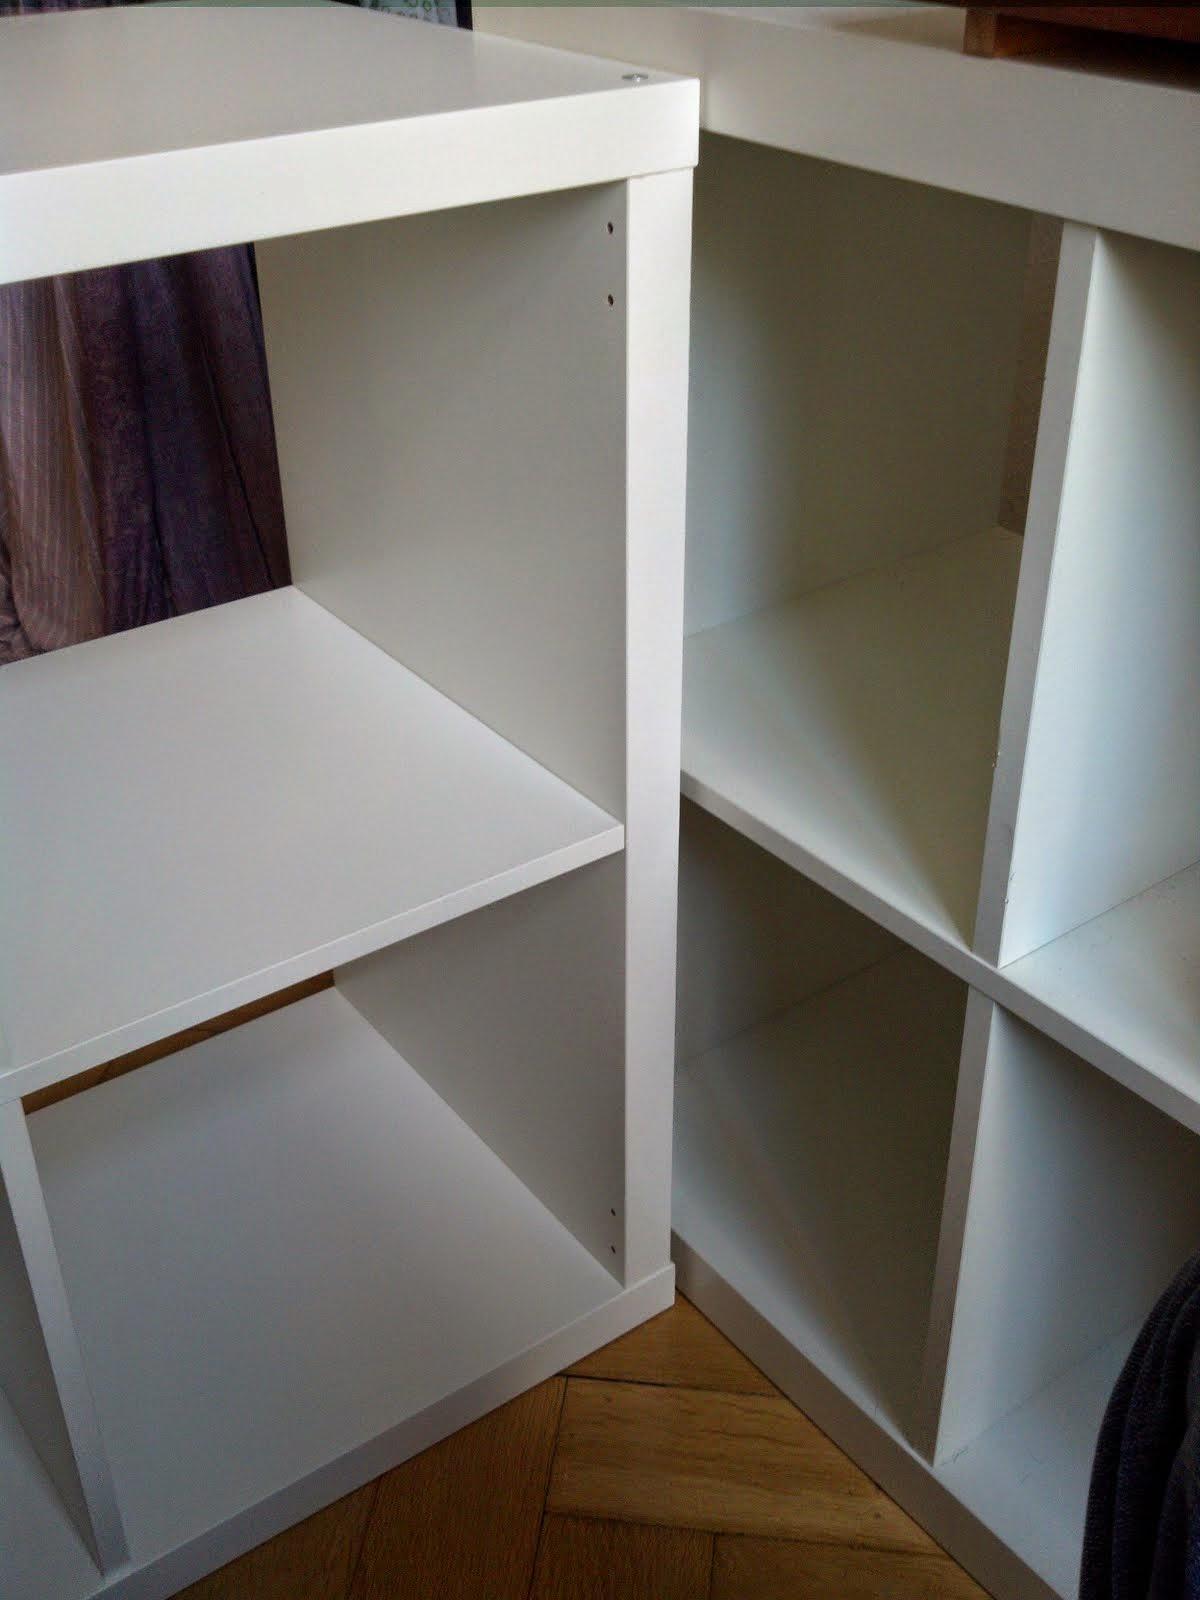 madcyborgs alltagsbilder kallax vs expedit. Black Bedroom Furniture Sets. Home Design Ideas